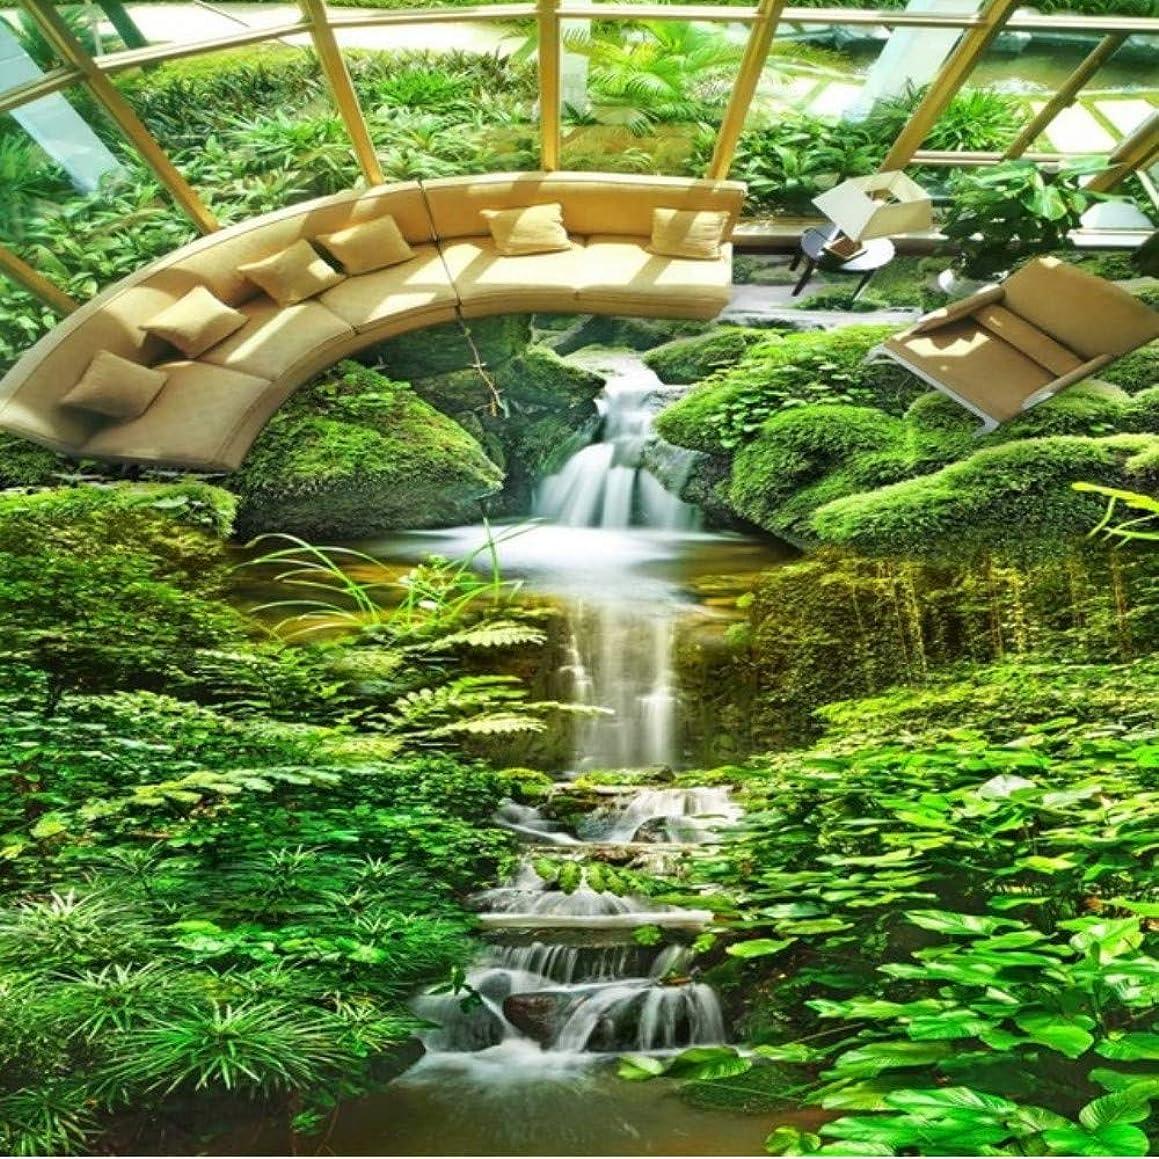 xbwy Custom Mountain Stream Natural Green Scenery Floor Painting 3D Balcony Flooring Wallpaper Mural-350X250Cm